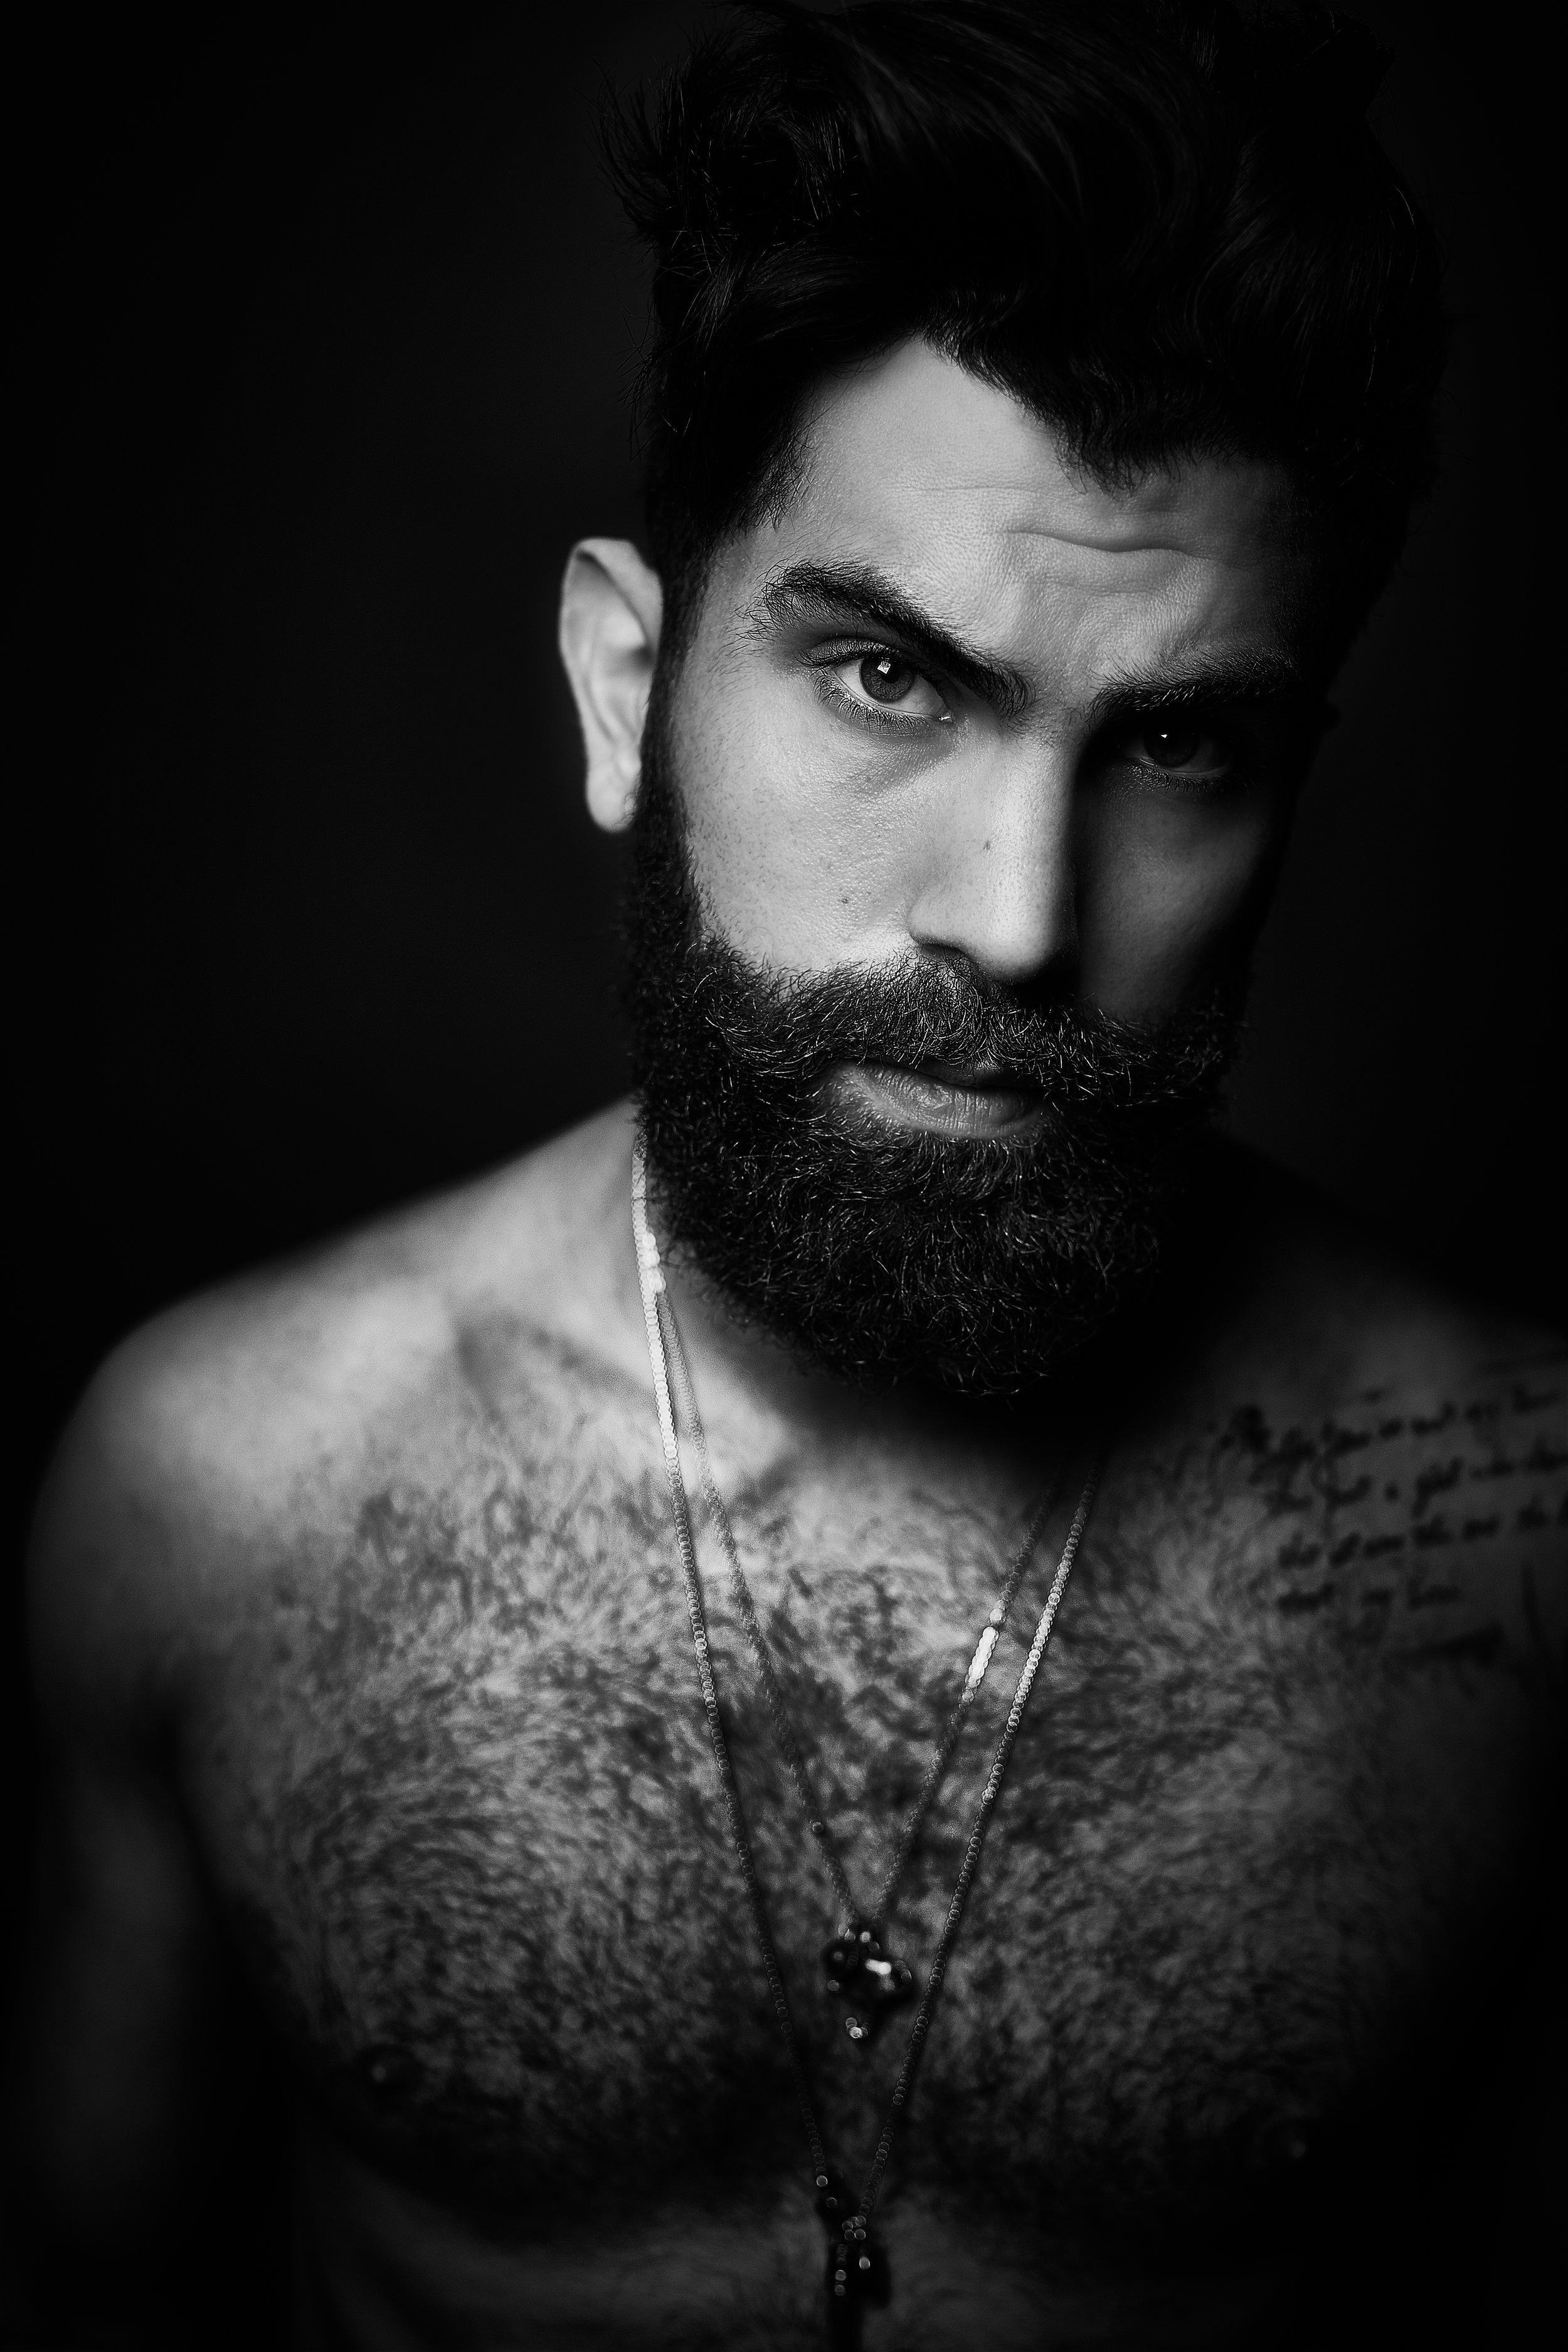 Portrait_063_Reza_Jackson_10282.jpg